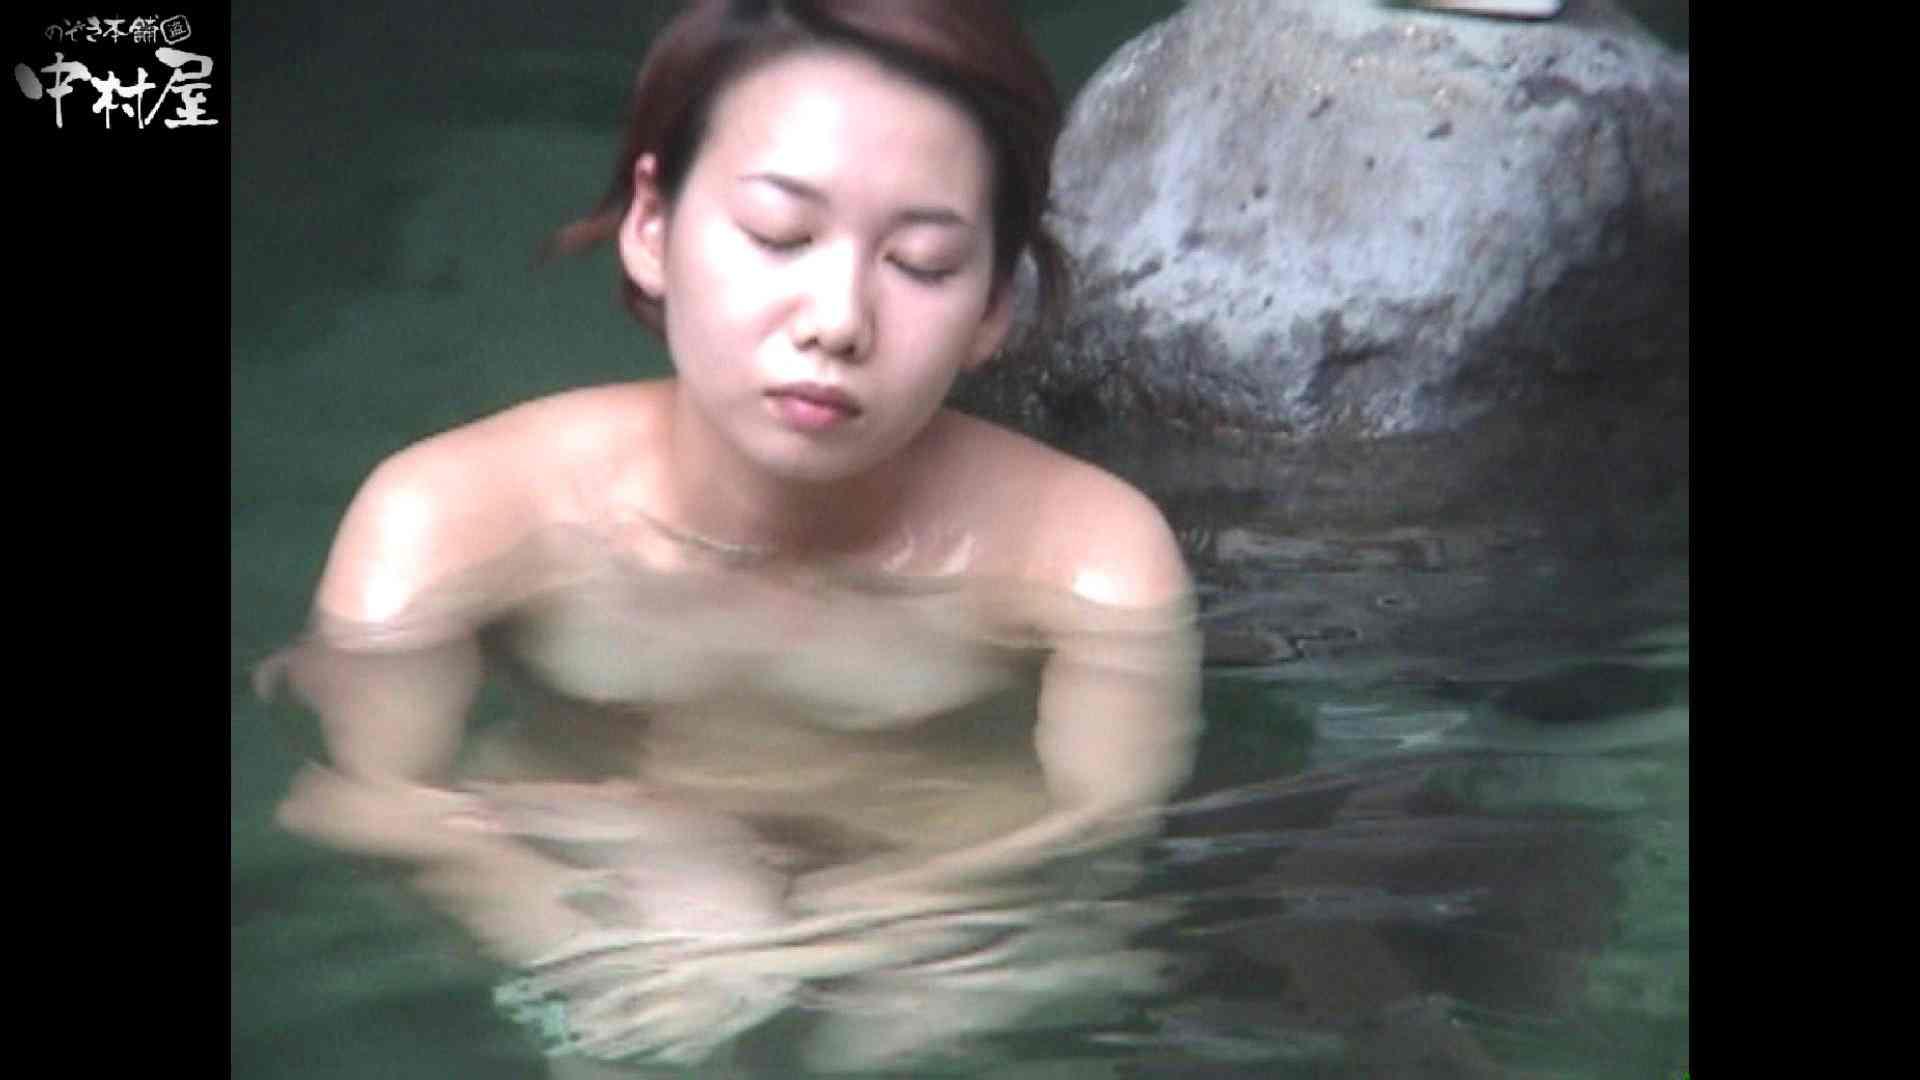 Aquaな露天風呂Vol.951 露天風呂 隠し撮りオマンコ動画紹介 80連発 44